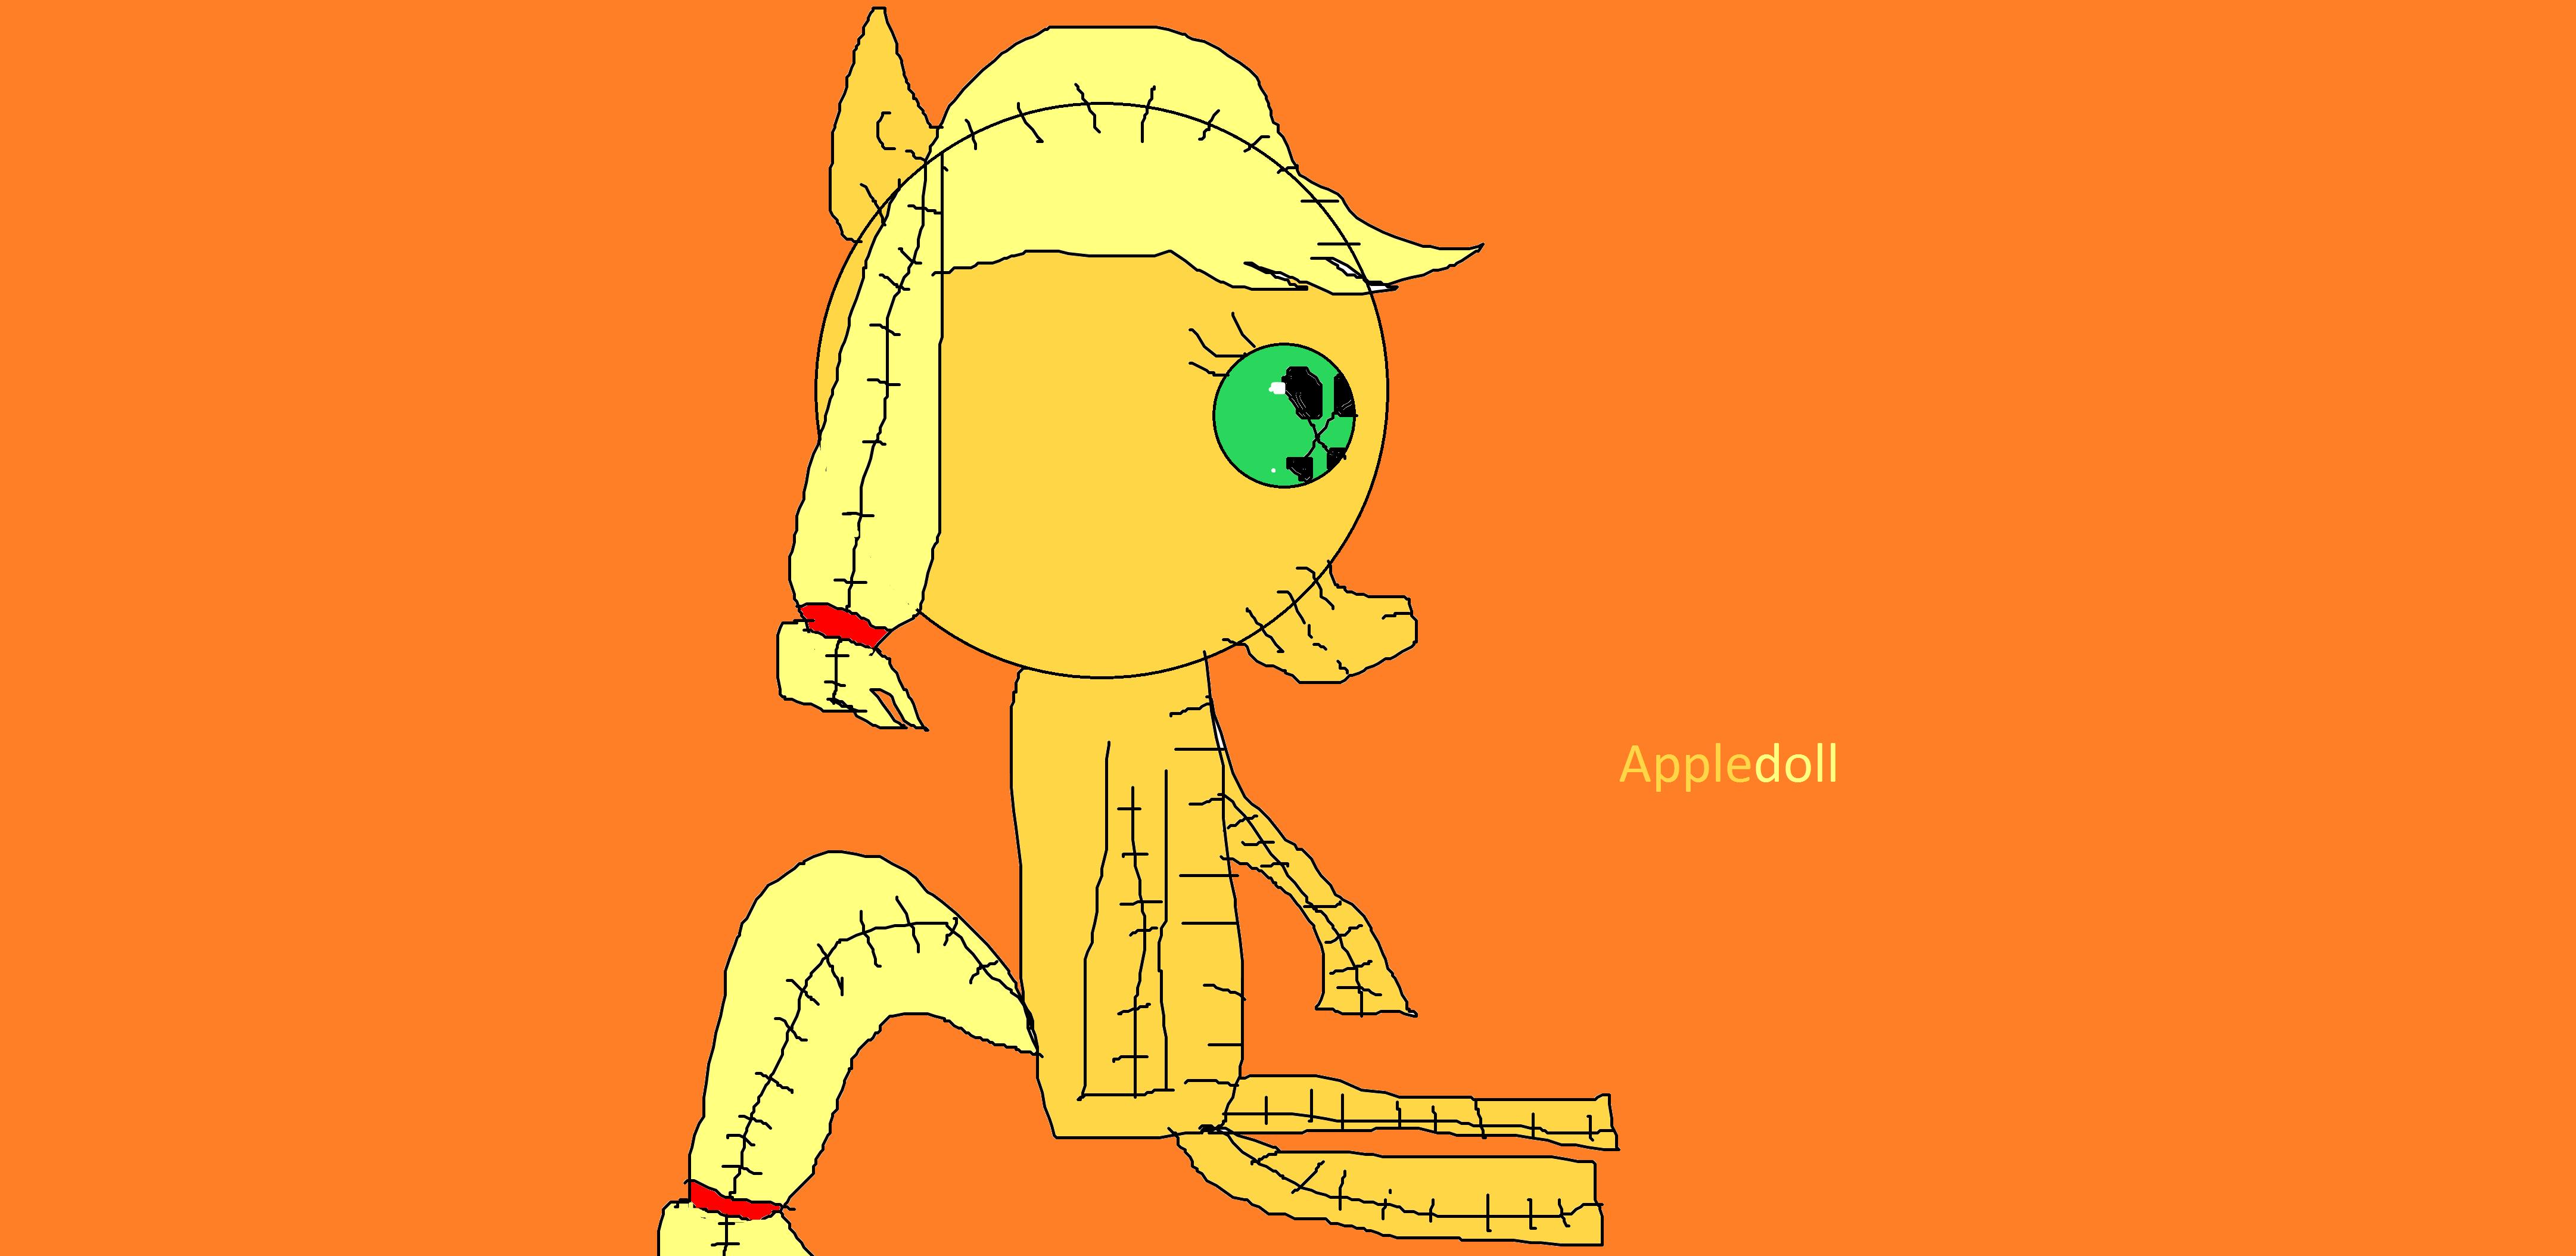 Appledoll